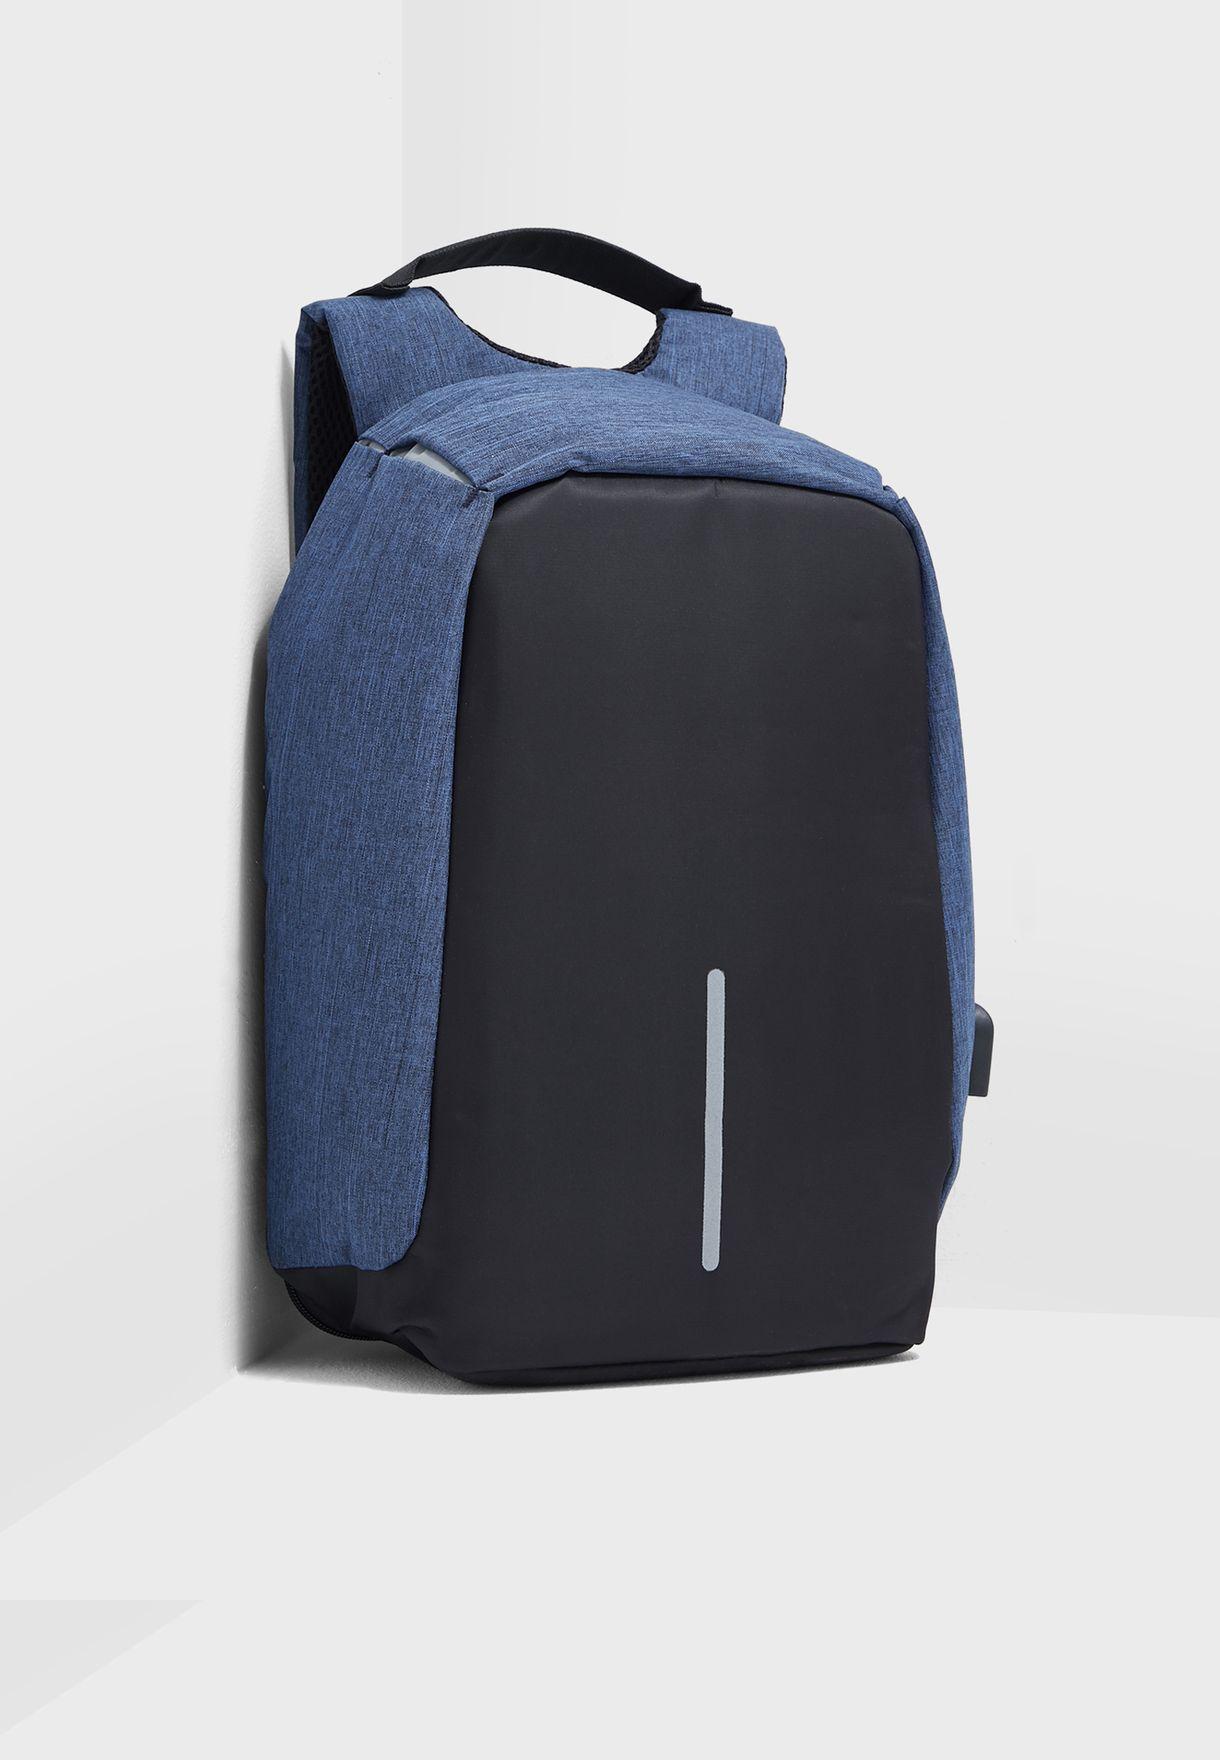 Office Laptop Back Pack